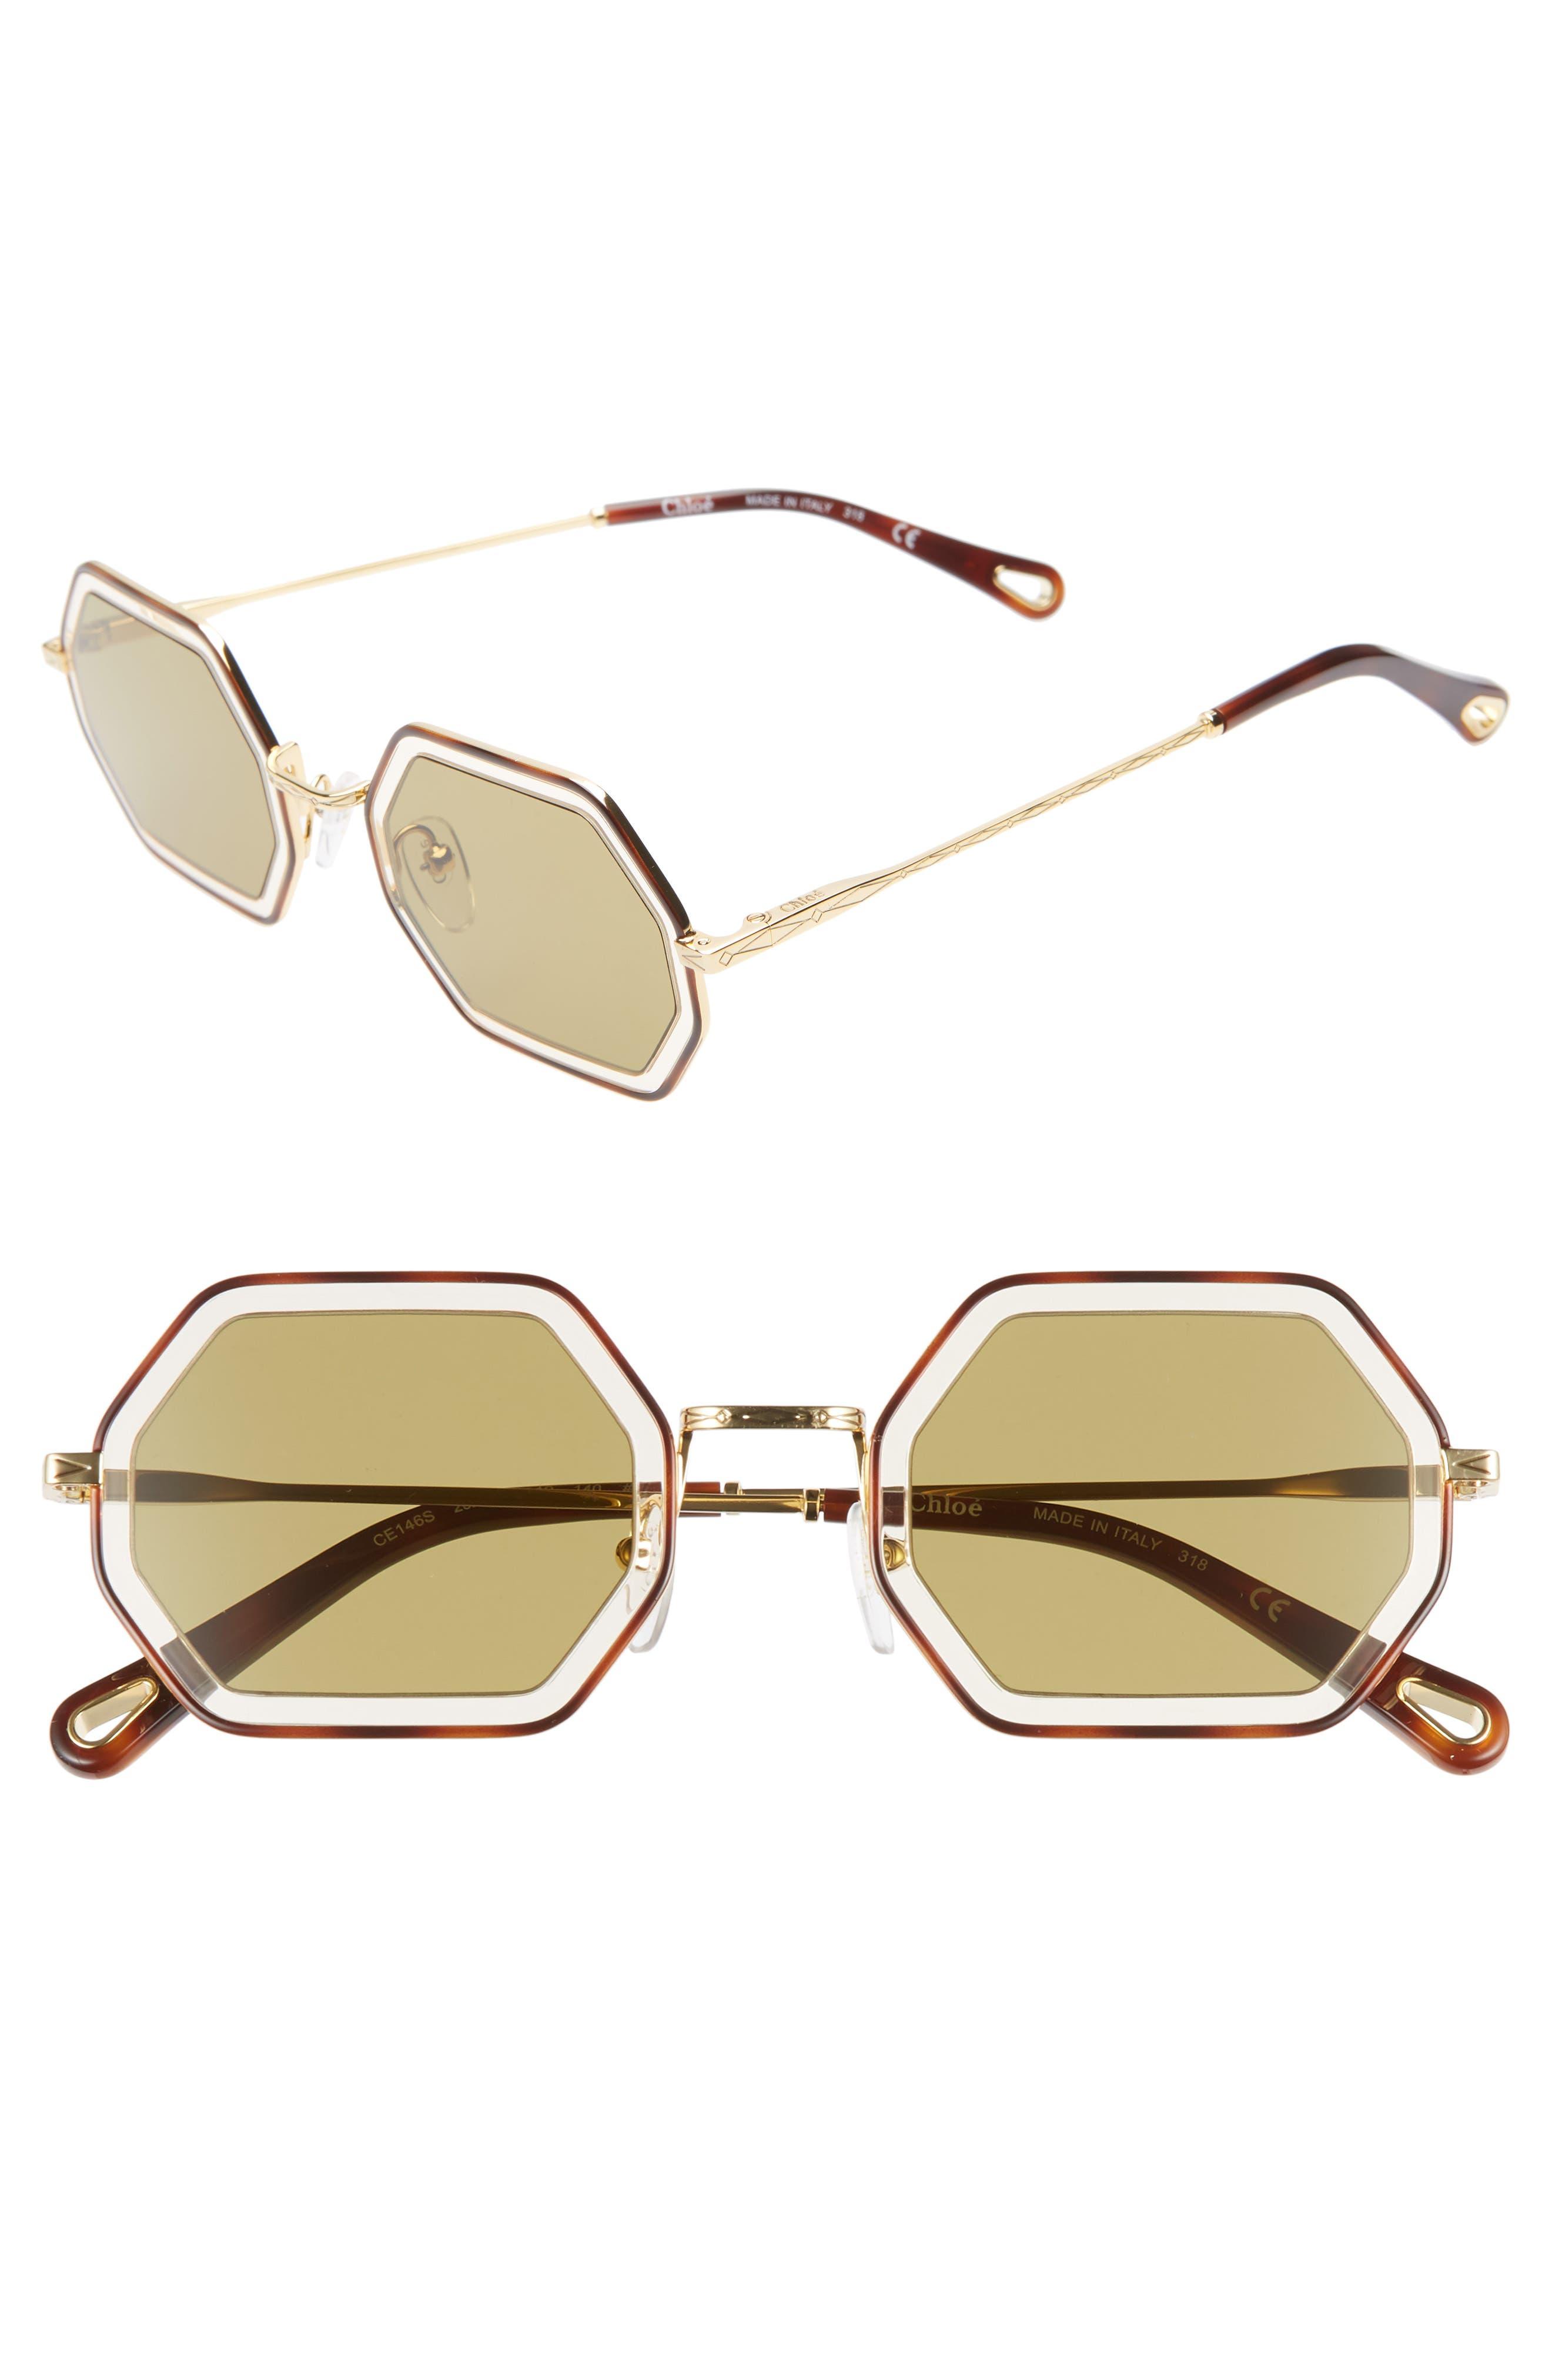 Chloe Tally 5m Octagon Sunglasses - Havana/ Sand/ Khaki